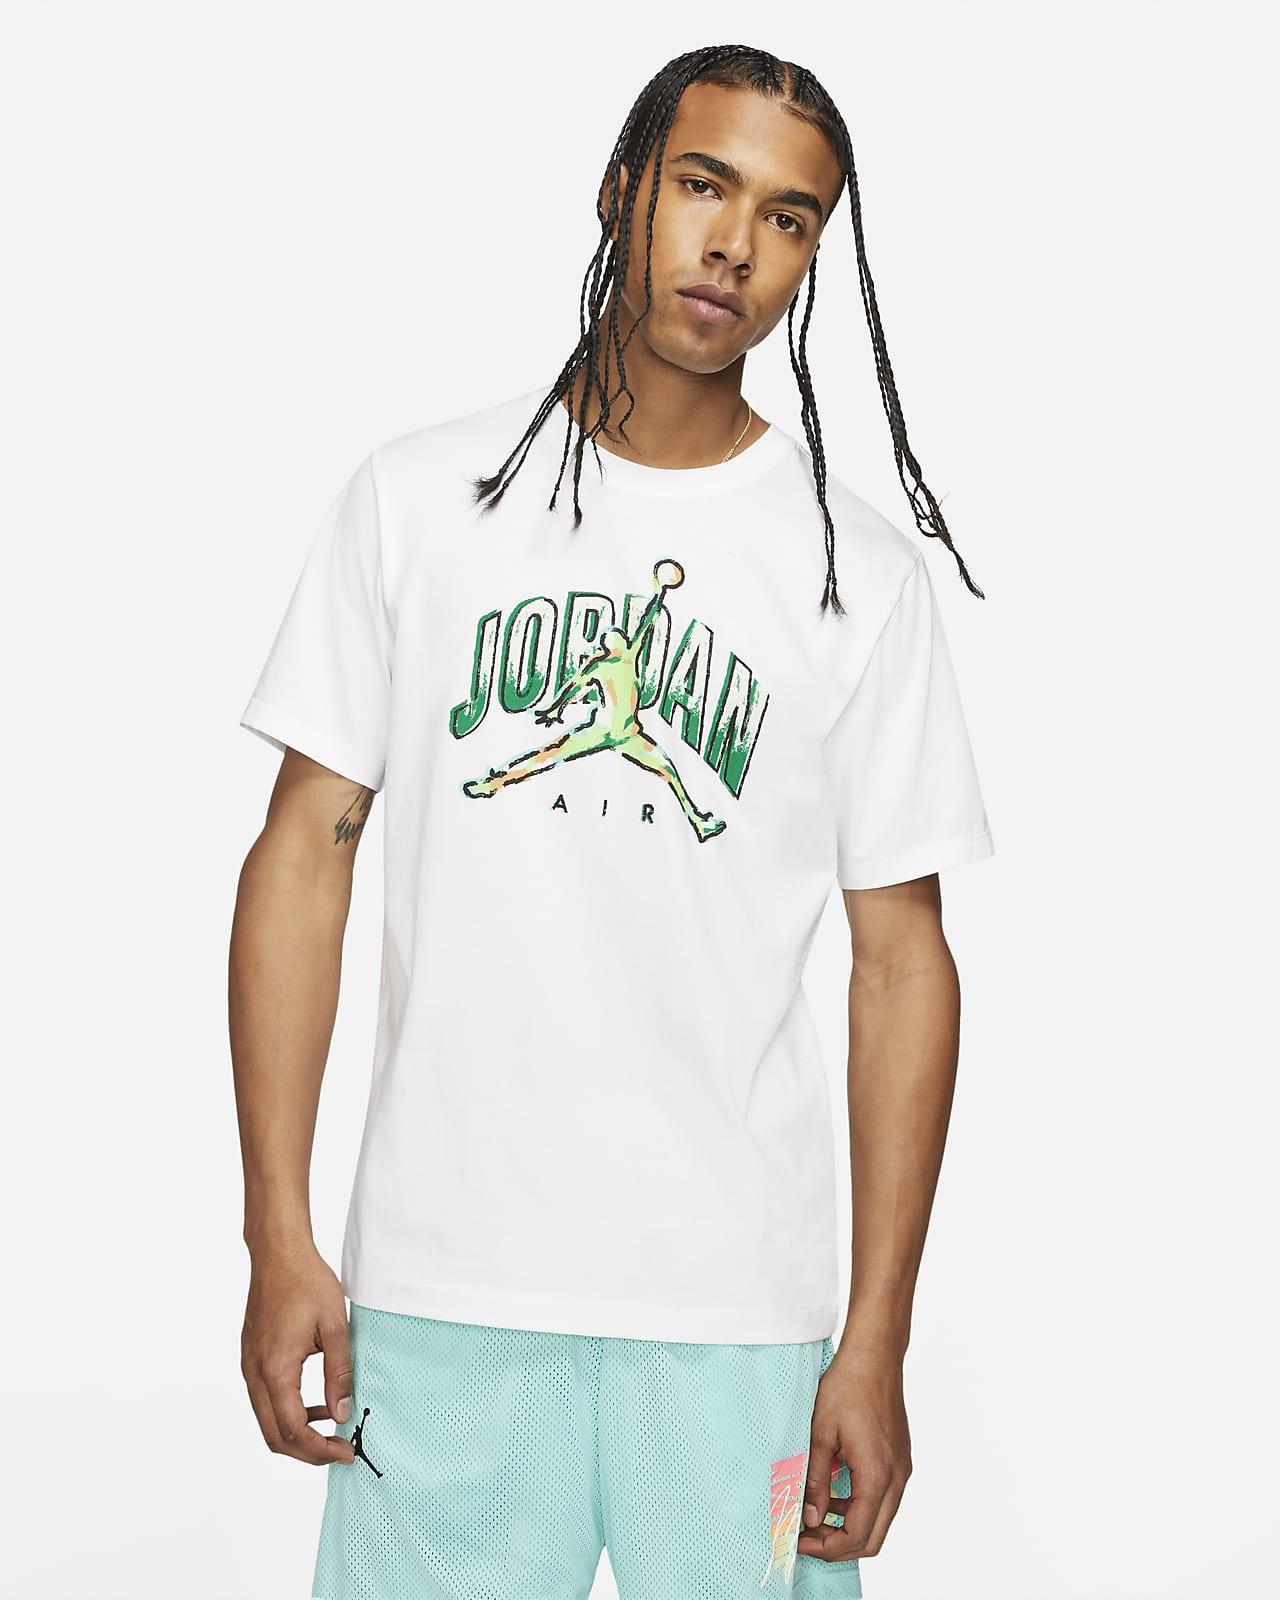 Jordan Air 男子短袖T恤